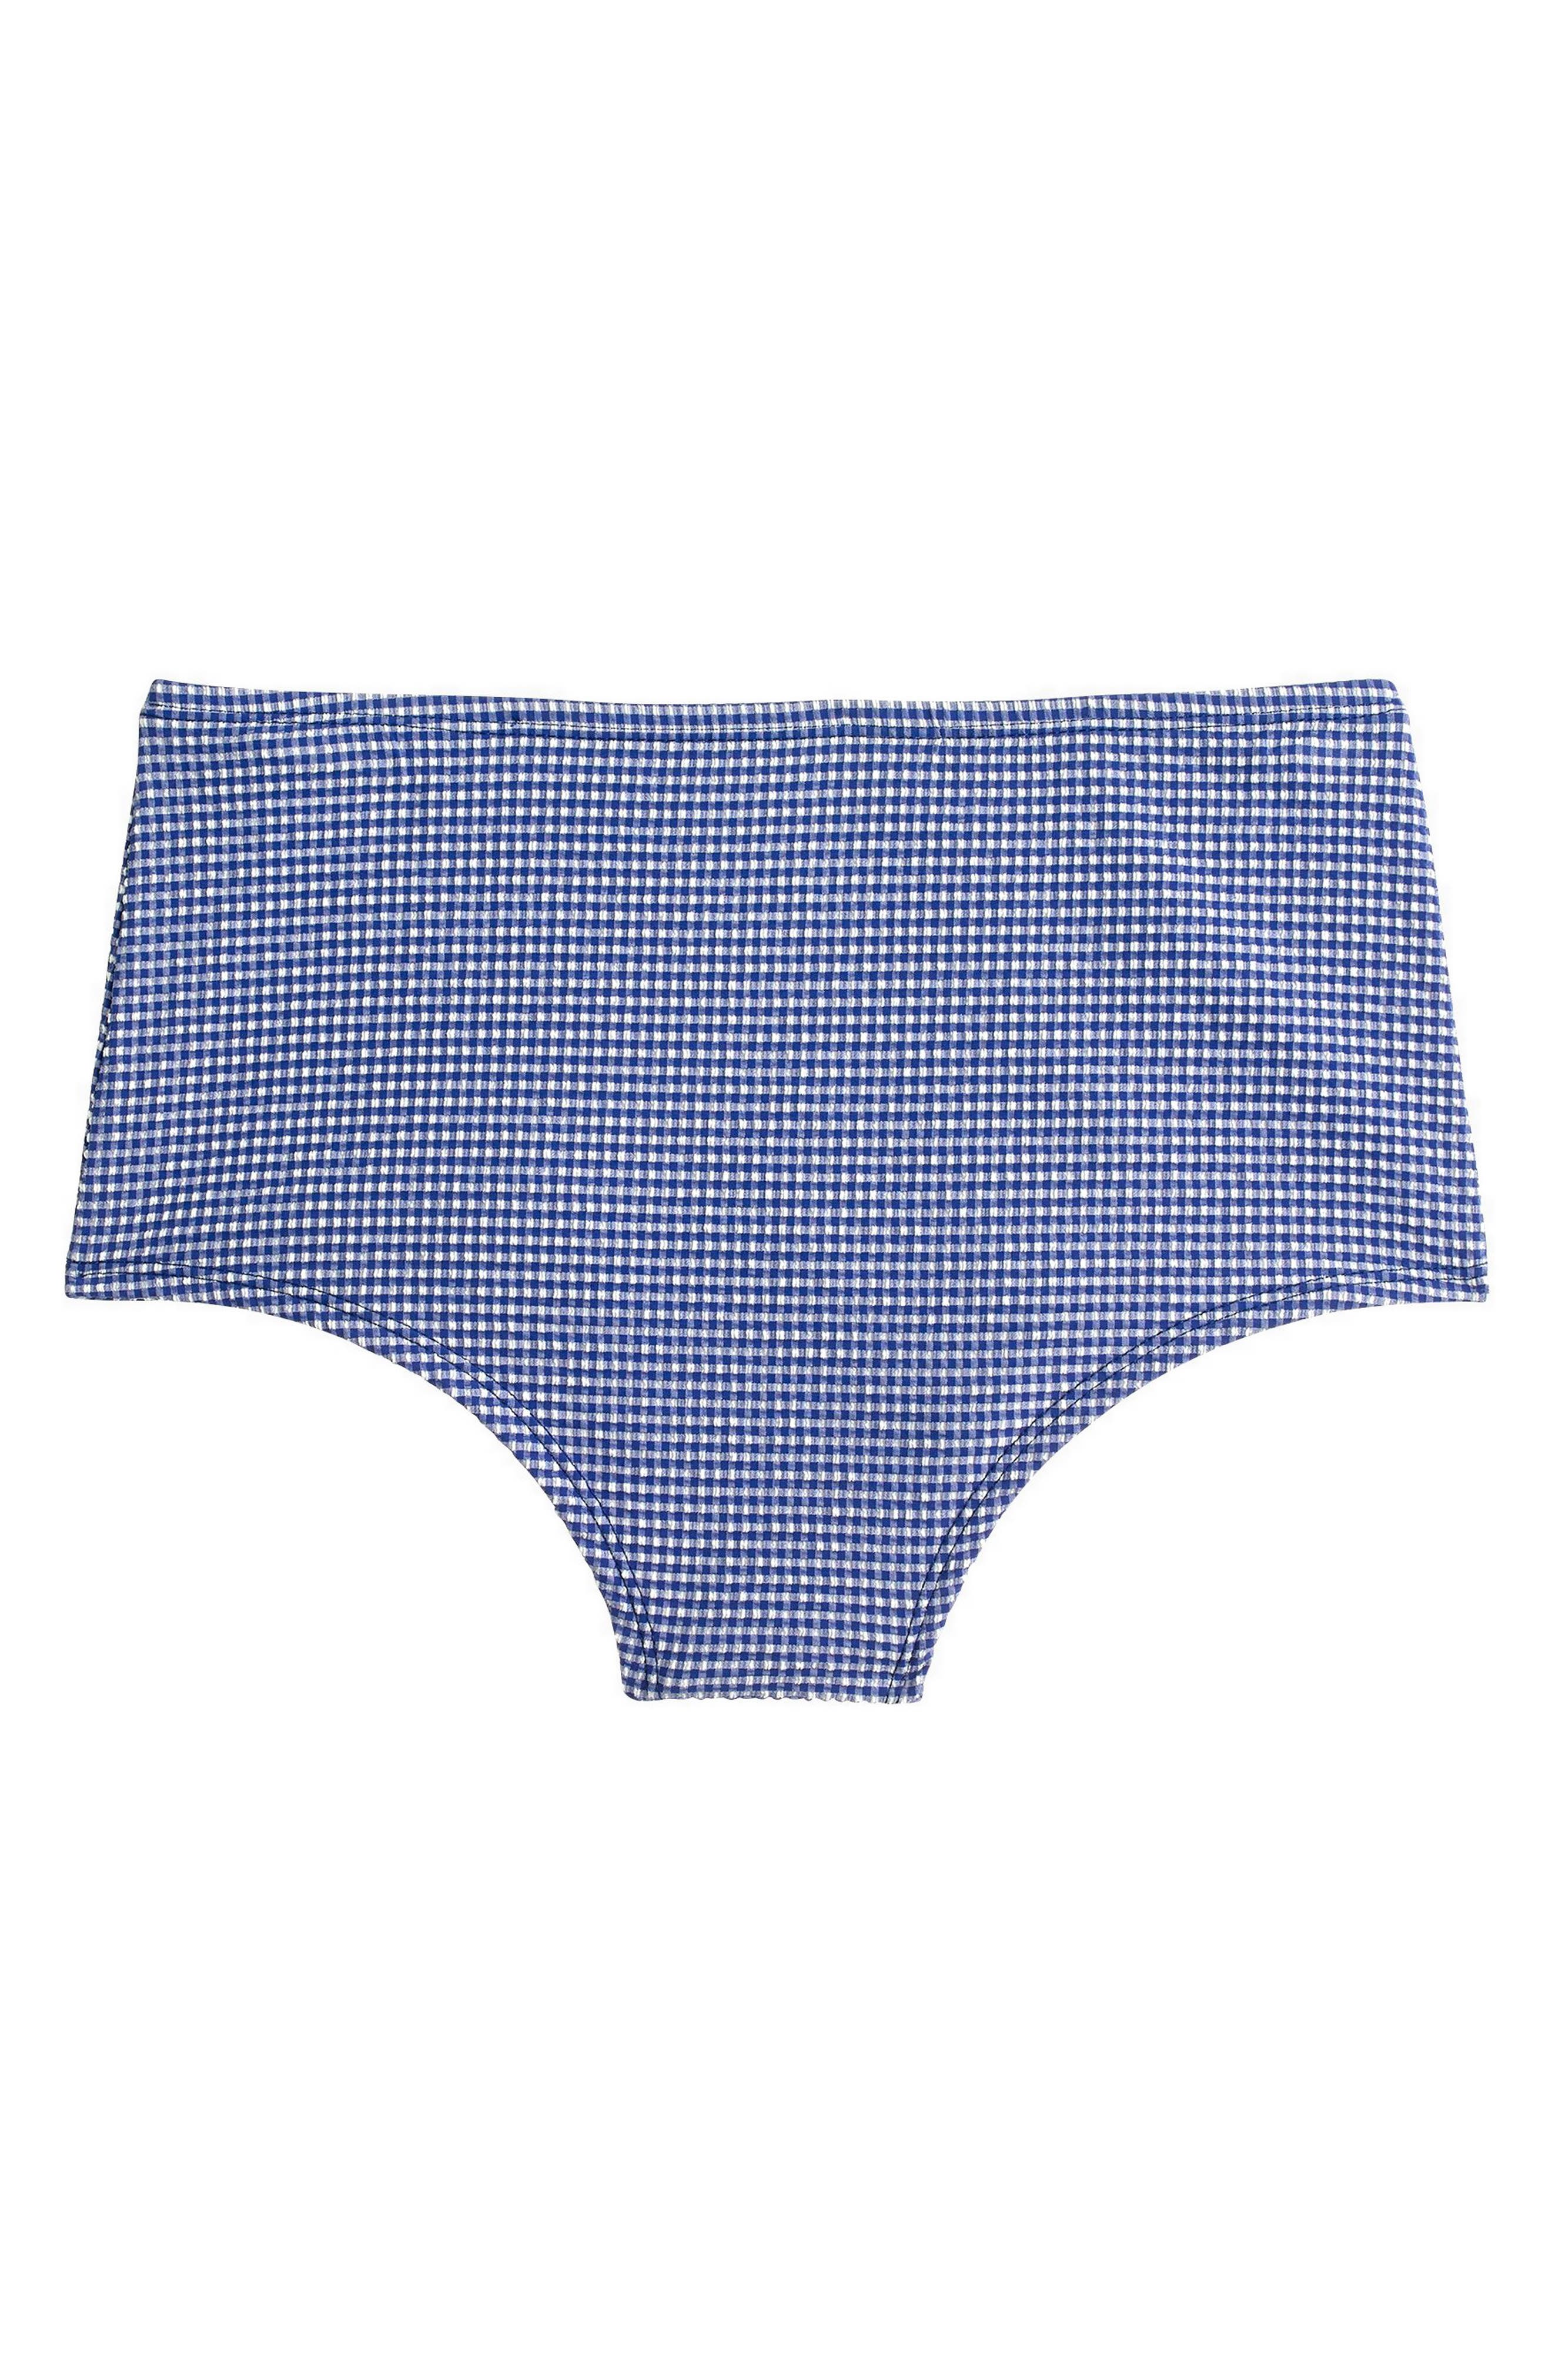 J.Crew High Waist Bikini Bottoms,                             Alternate thumbnail 5, color,                             Blue